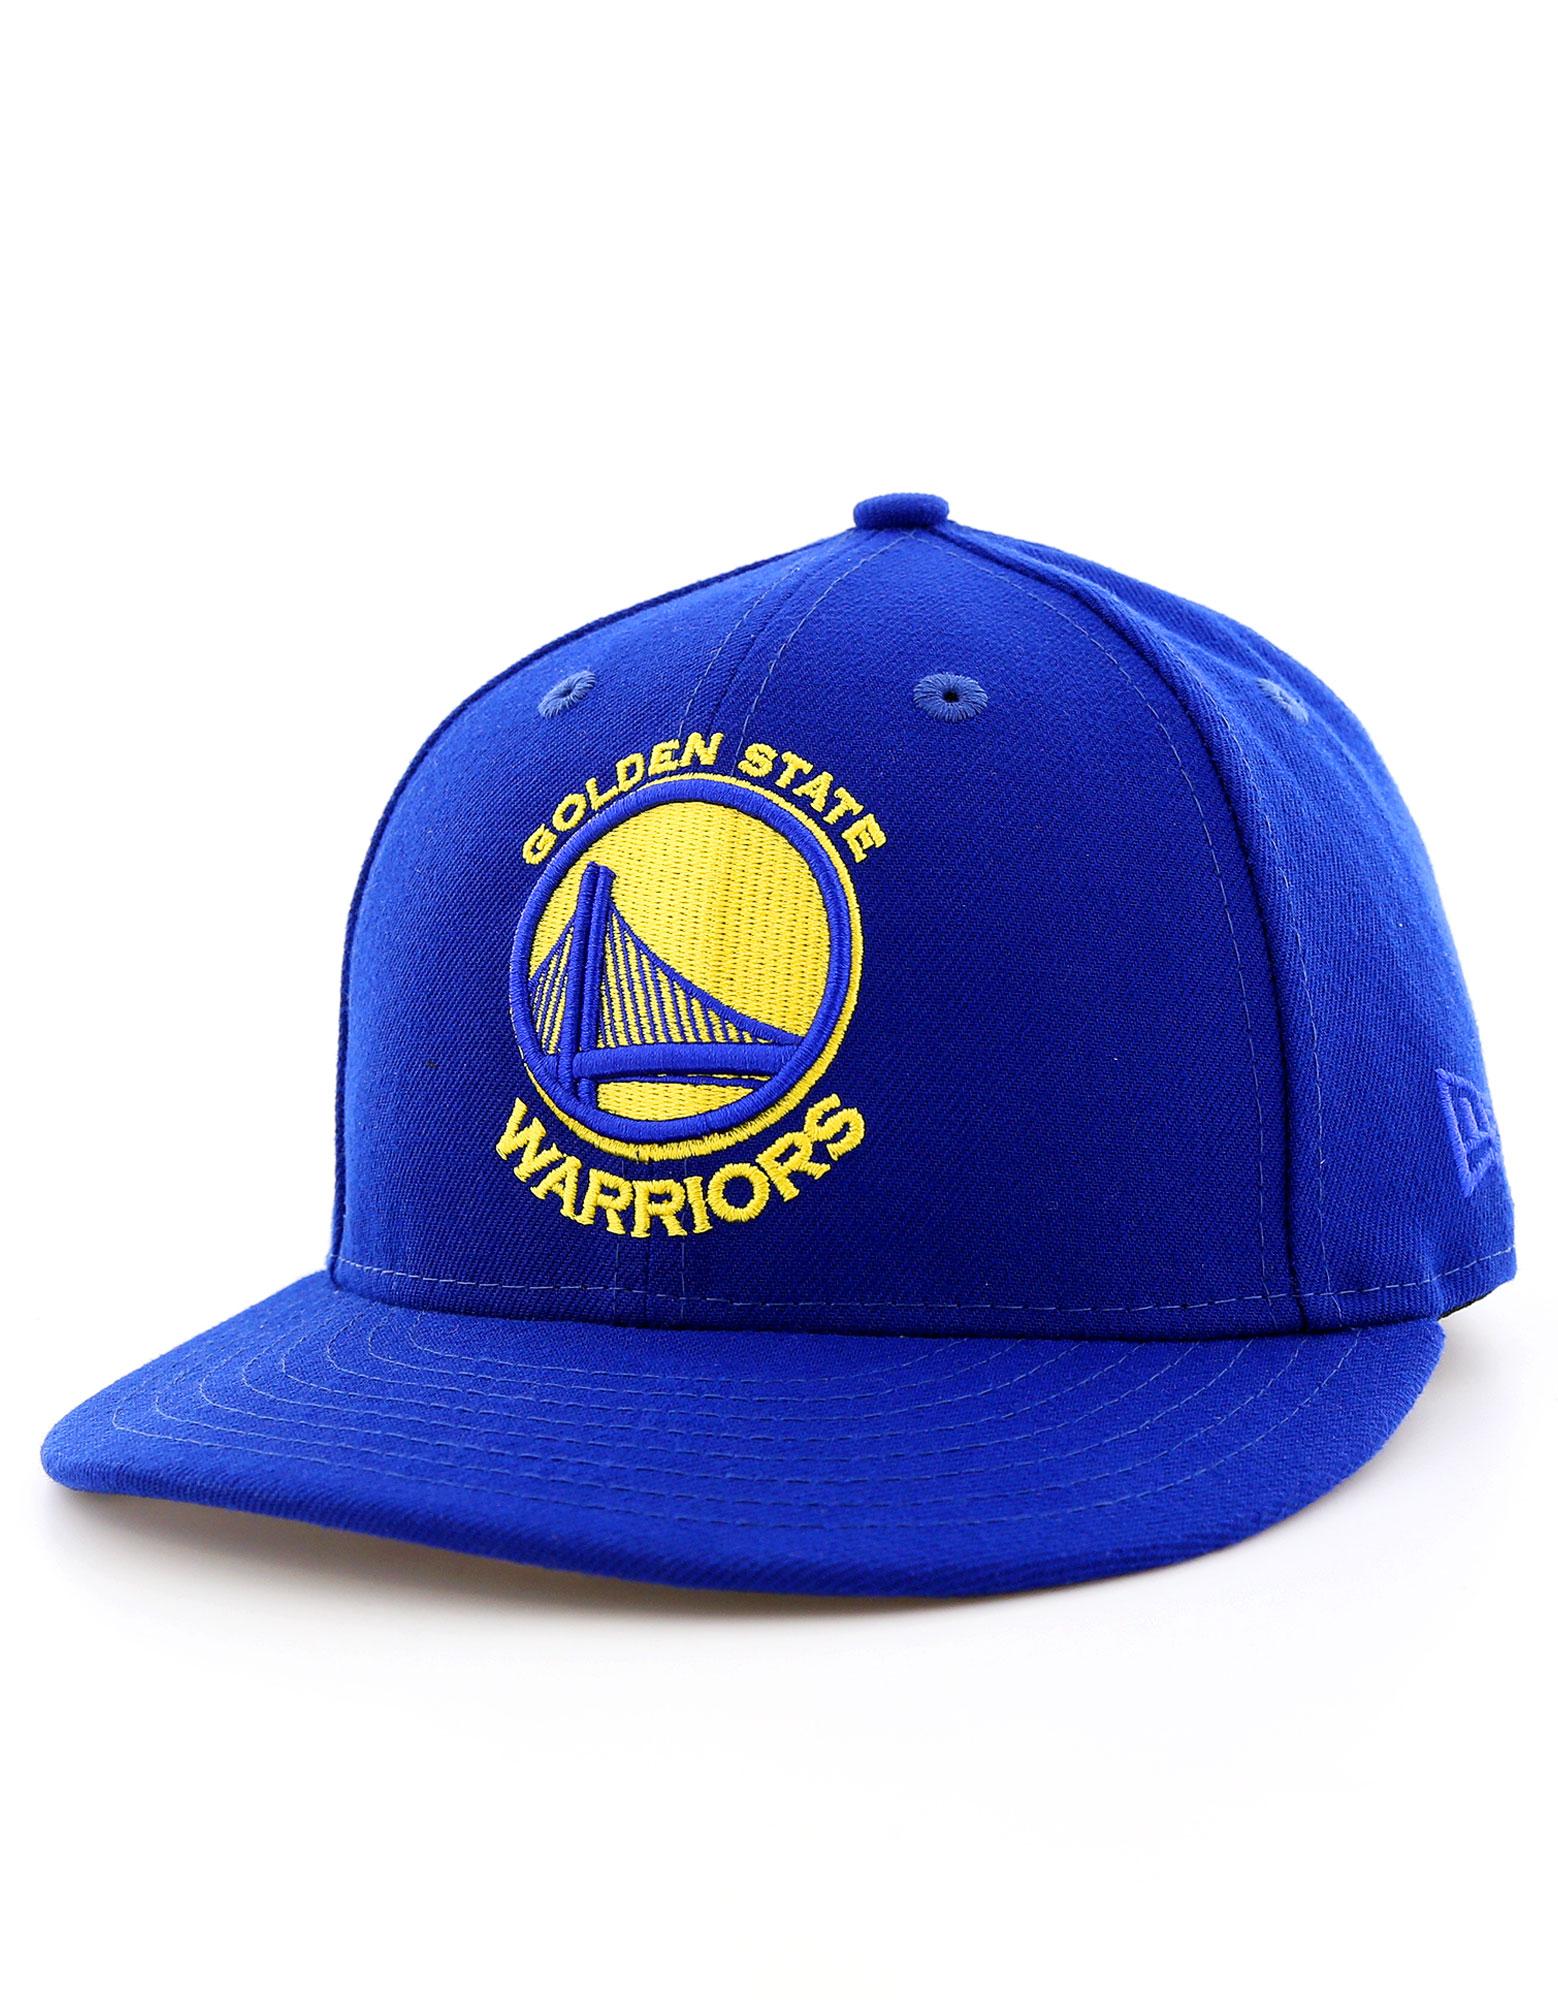 New Era Team Classic Lp Gs Warriors Blue Cap 7 1/4